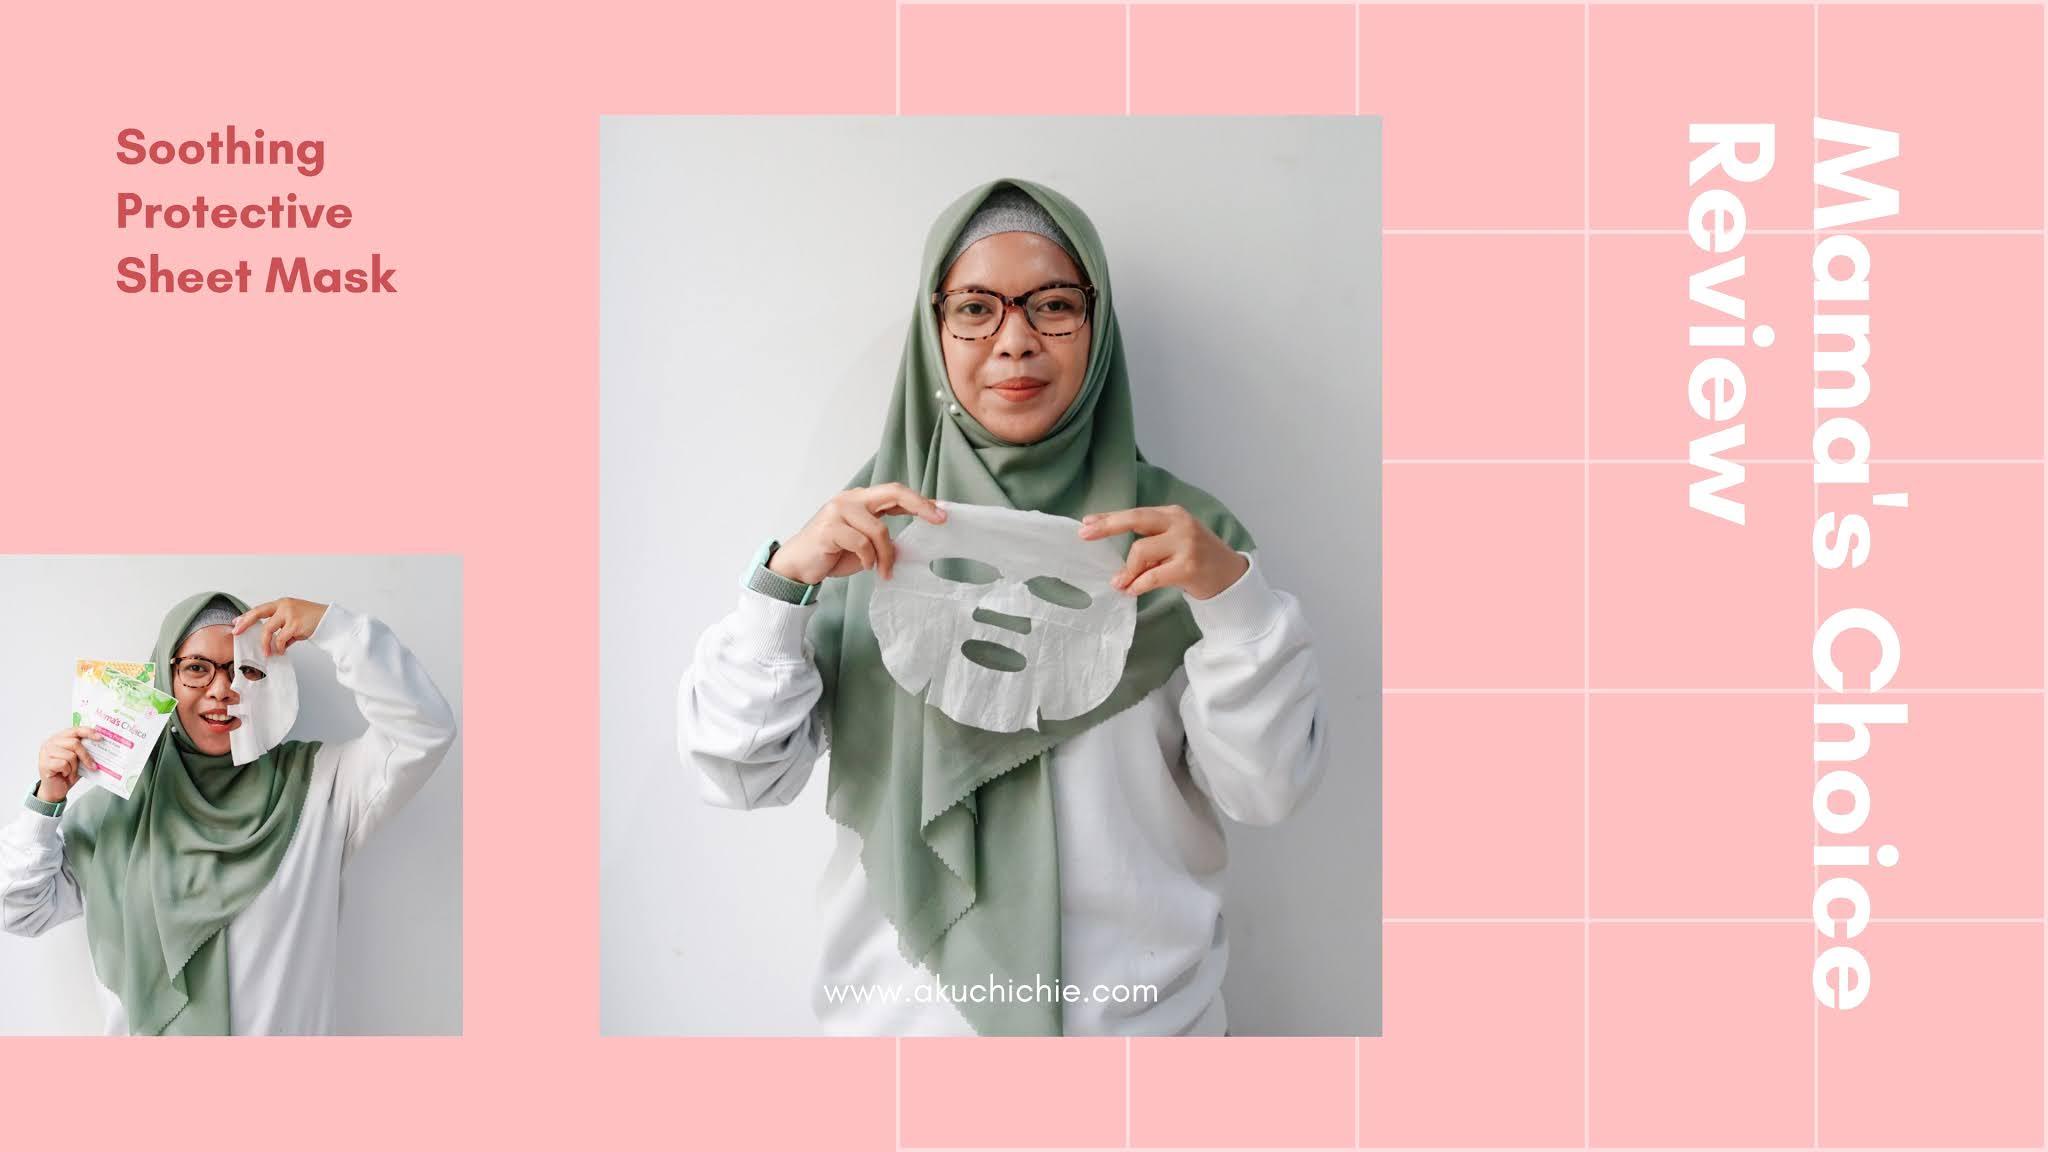 Mama's Choice Soothine Protective Sheet Mask